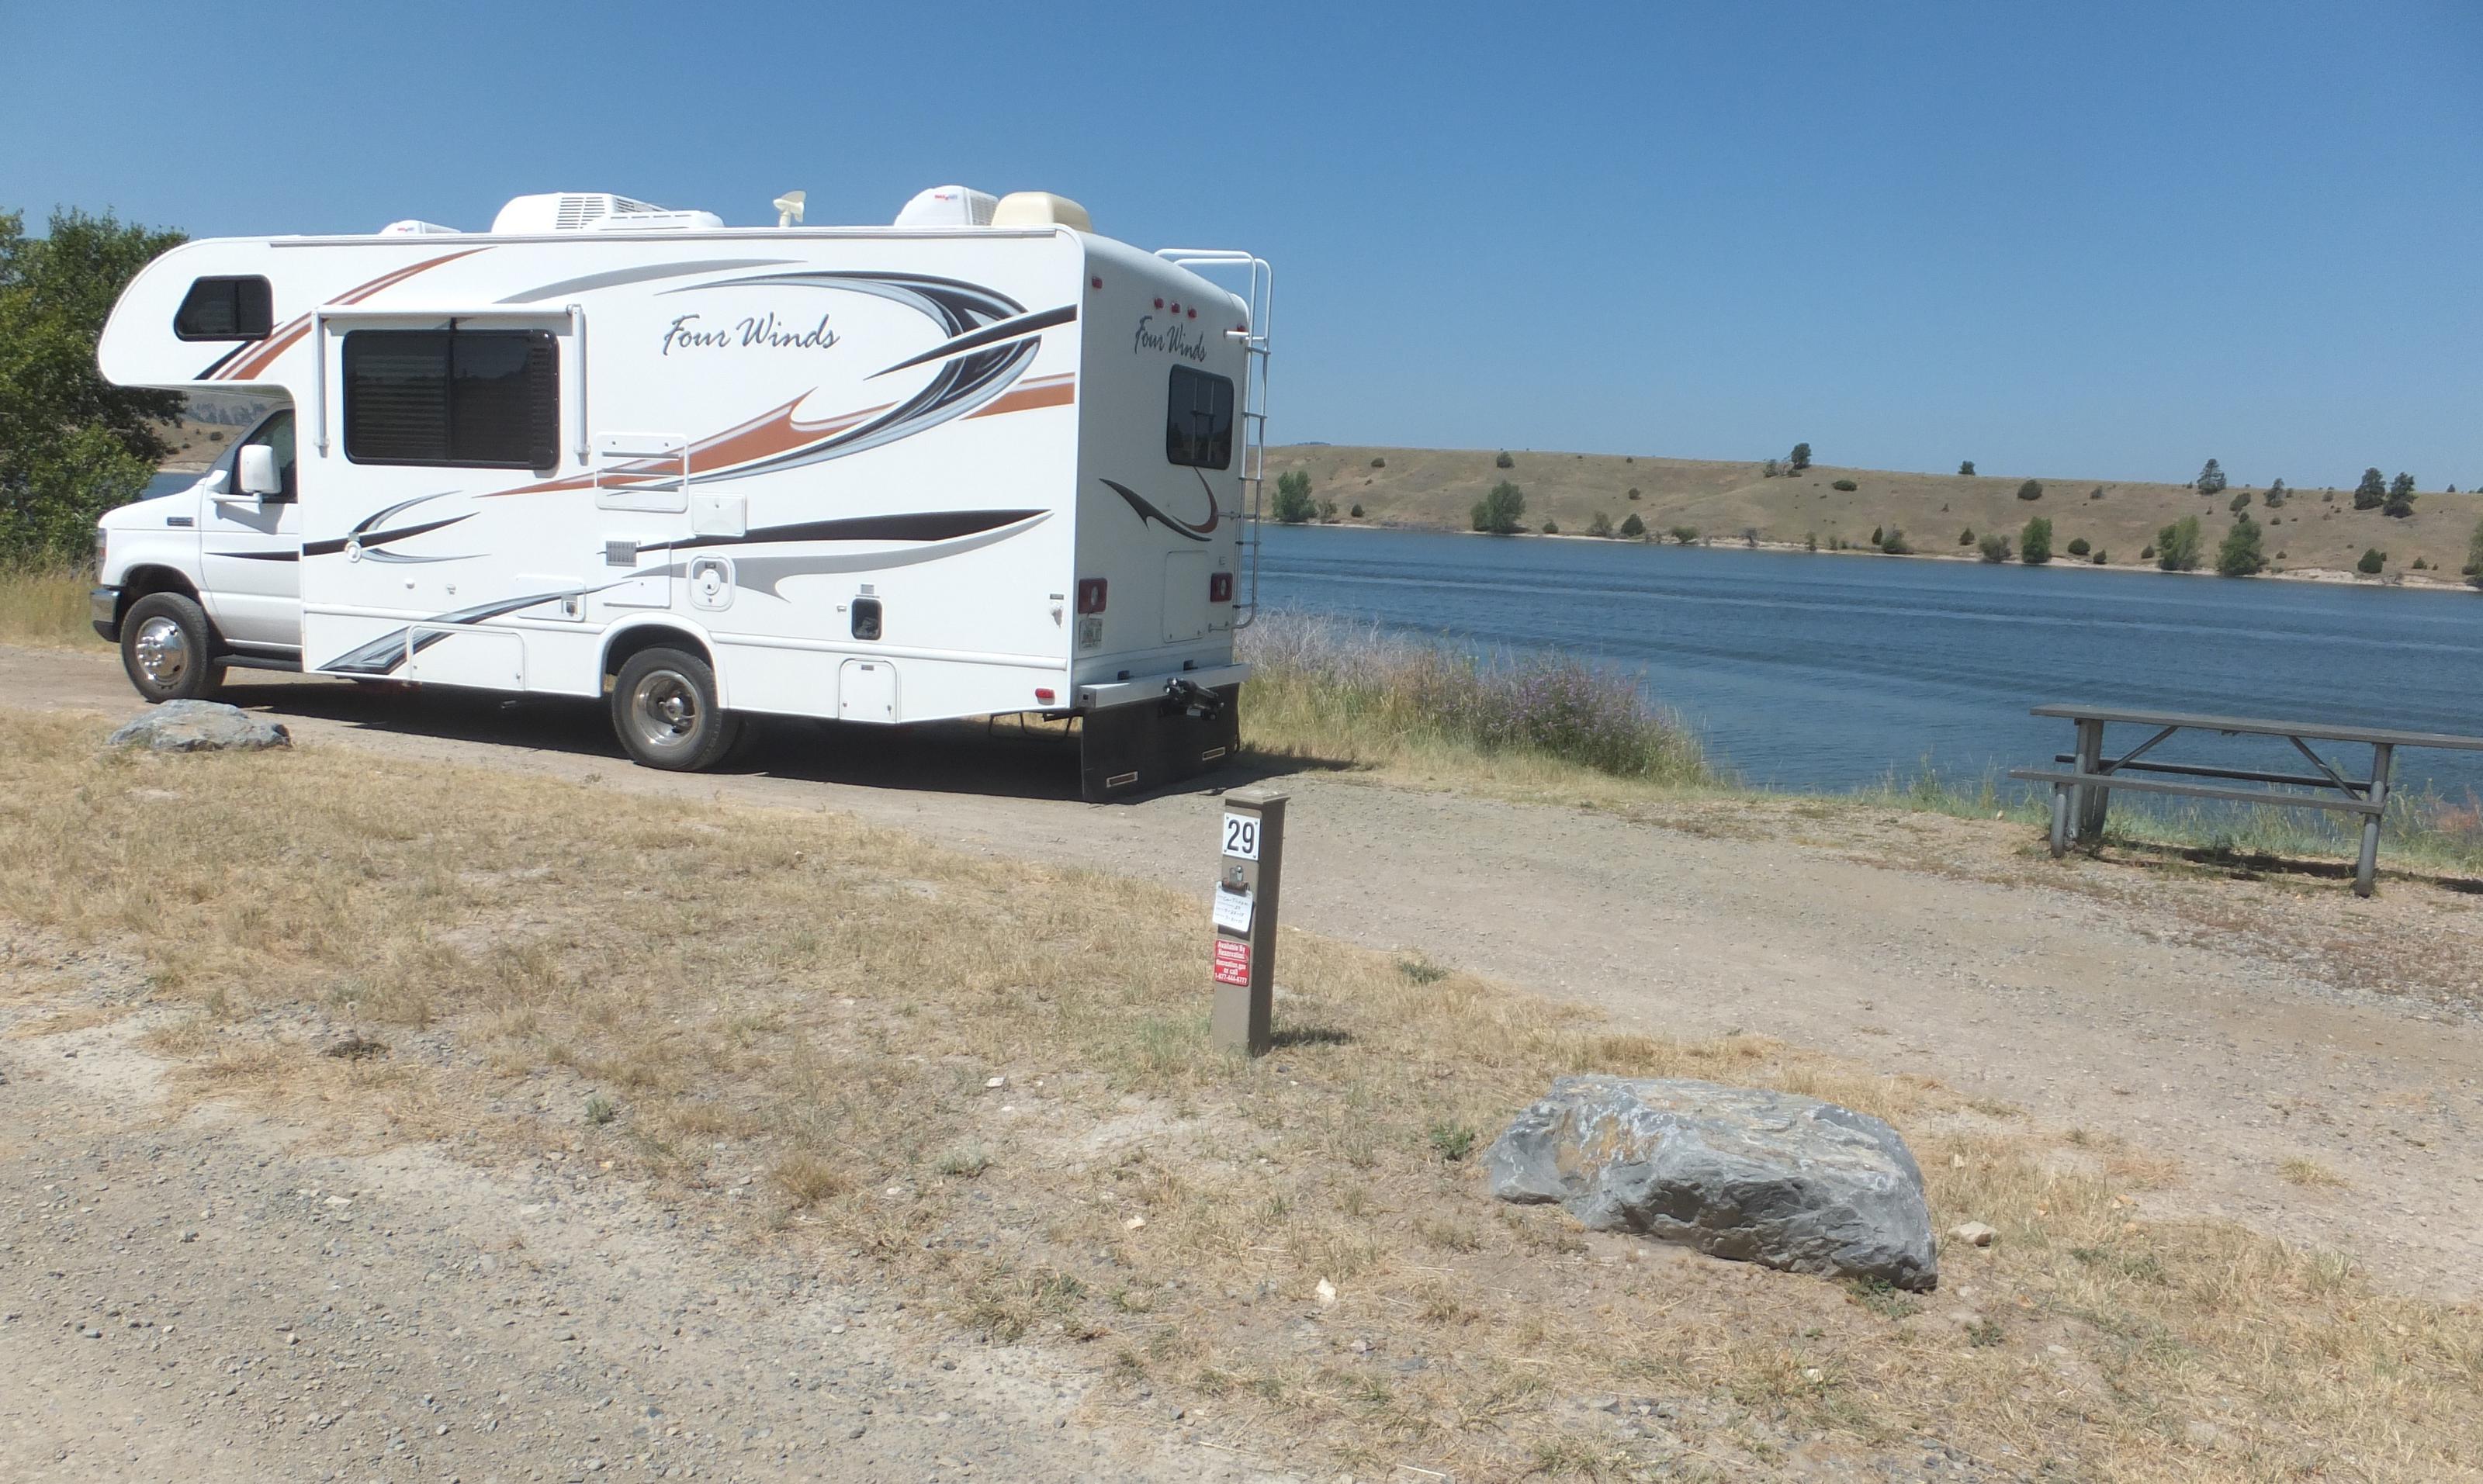 Hellgate Campground - Campsite 29